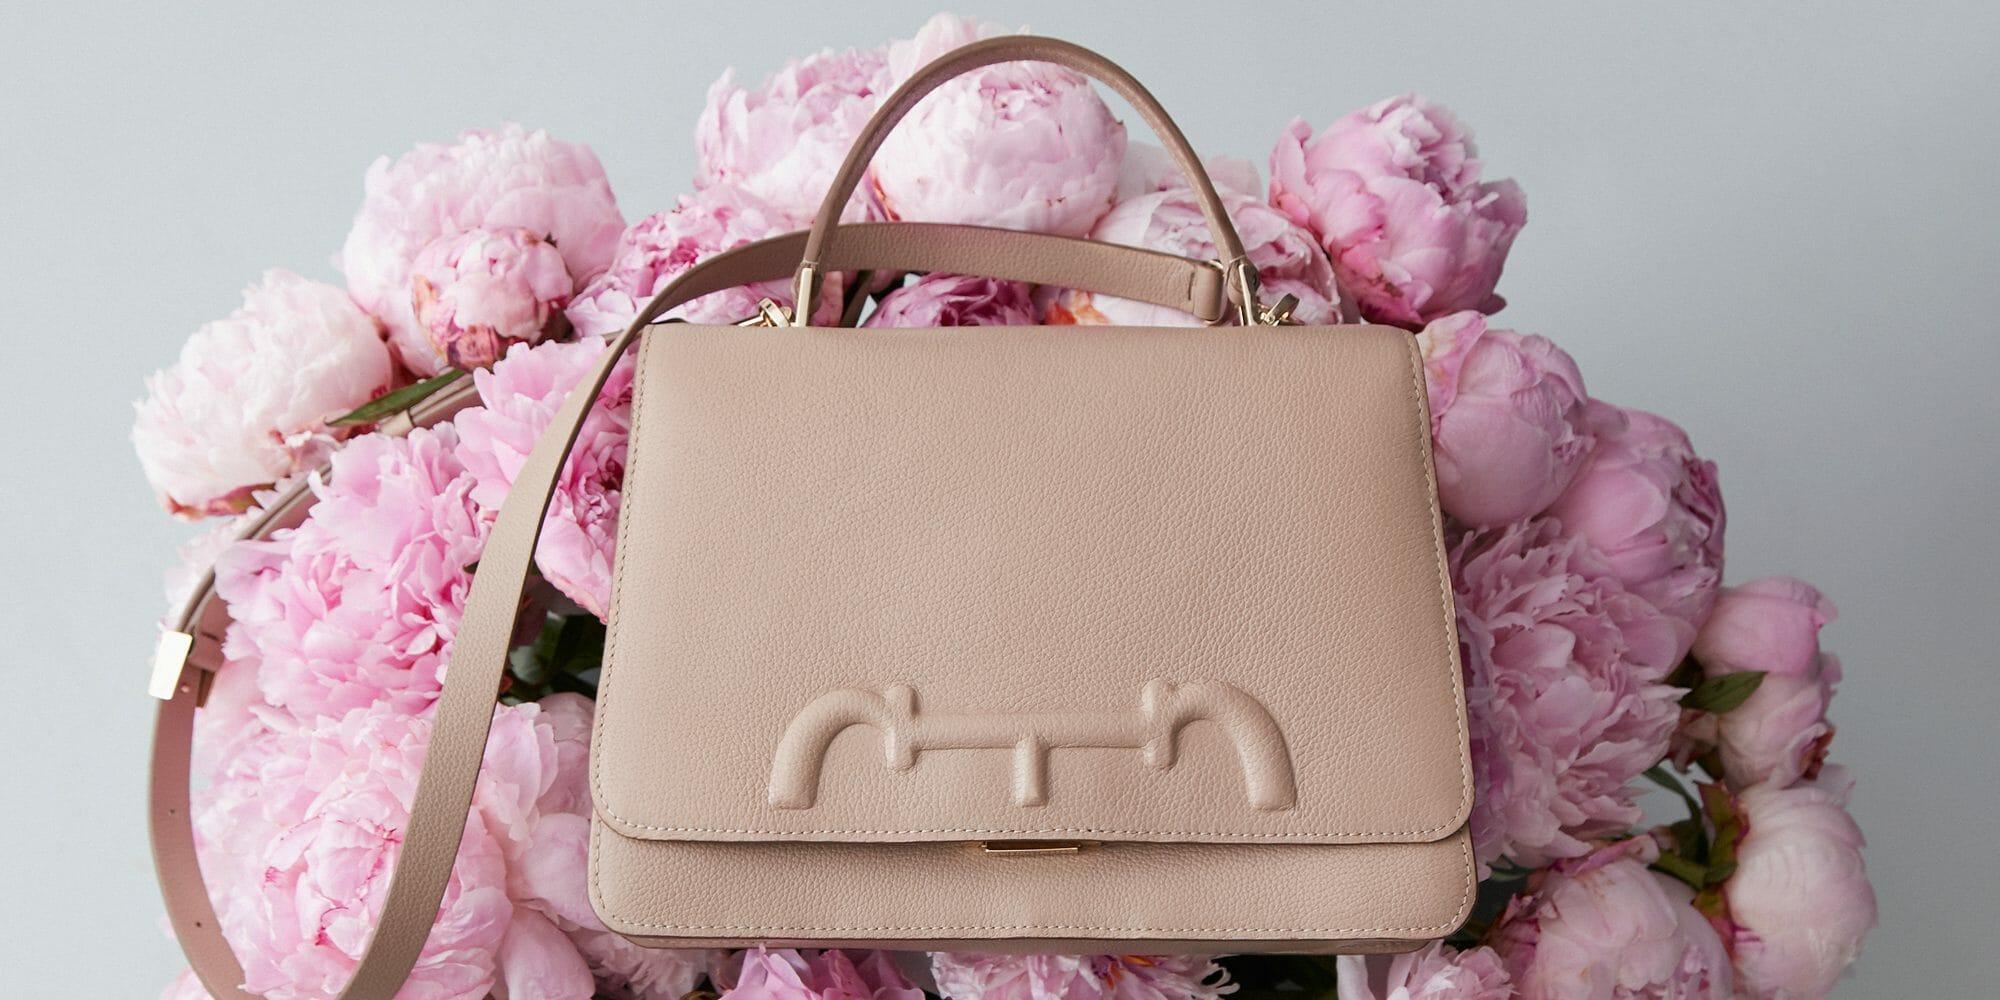 ch_carolina_herrera_bags_victoria_insignia_flowers_nude